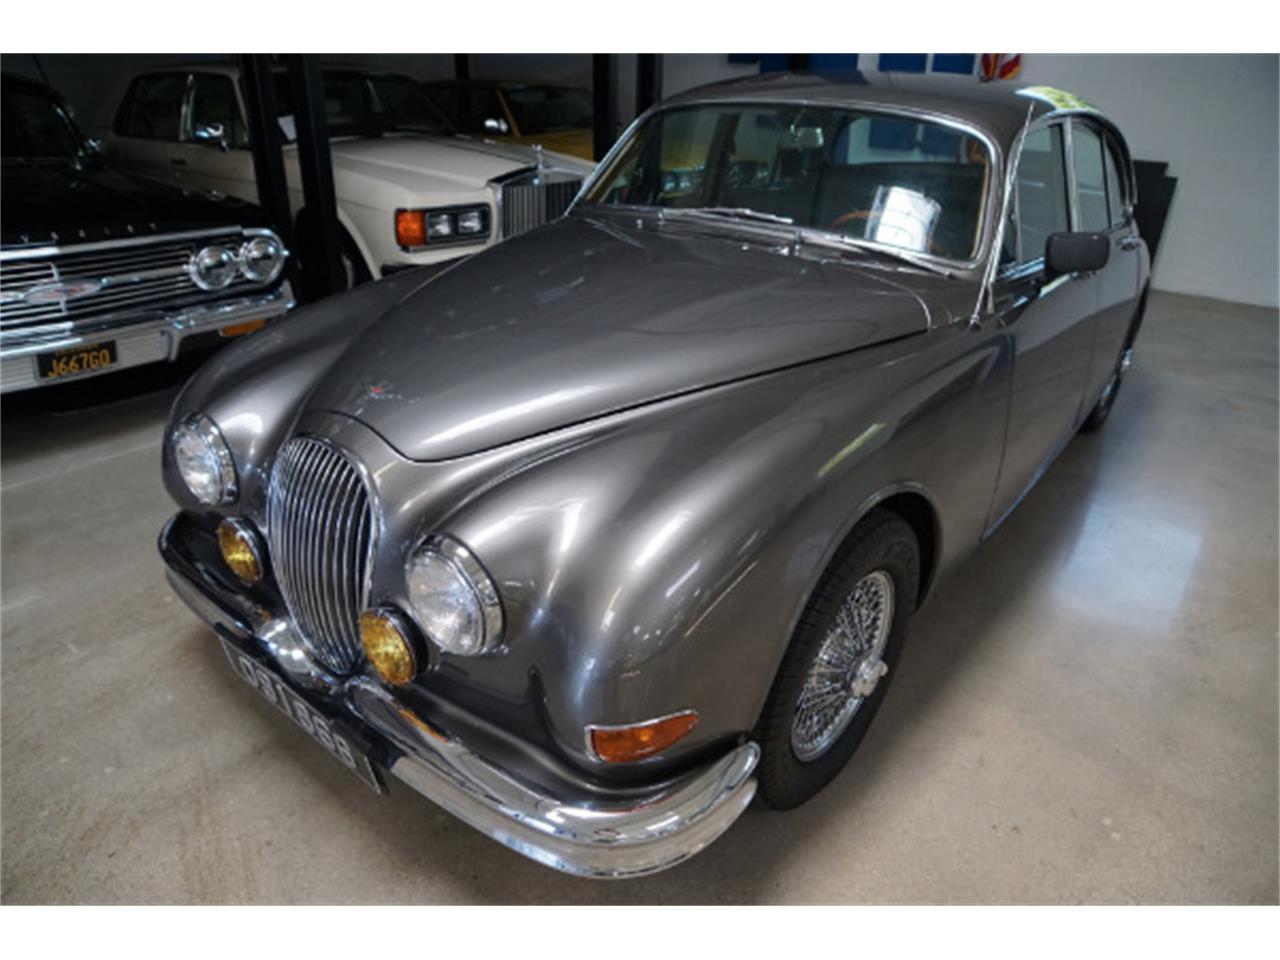 Jaguar Santa Monica >> 1967 Jaguar Mark Ii For Sale Classiccars Com Cc 1019032